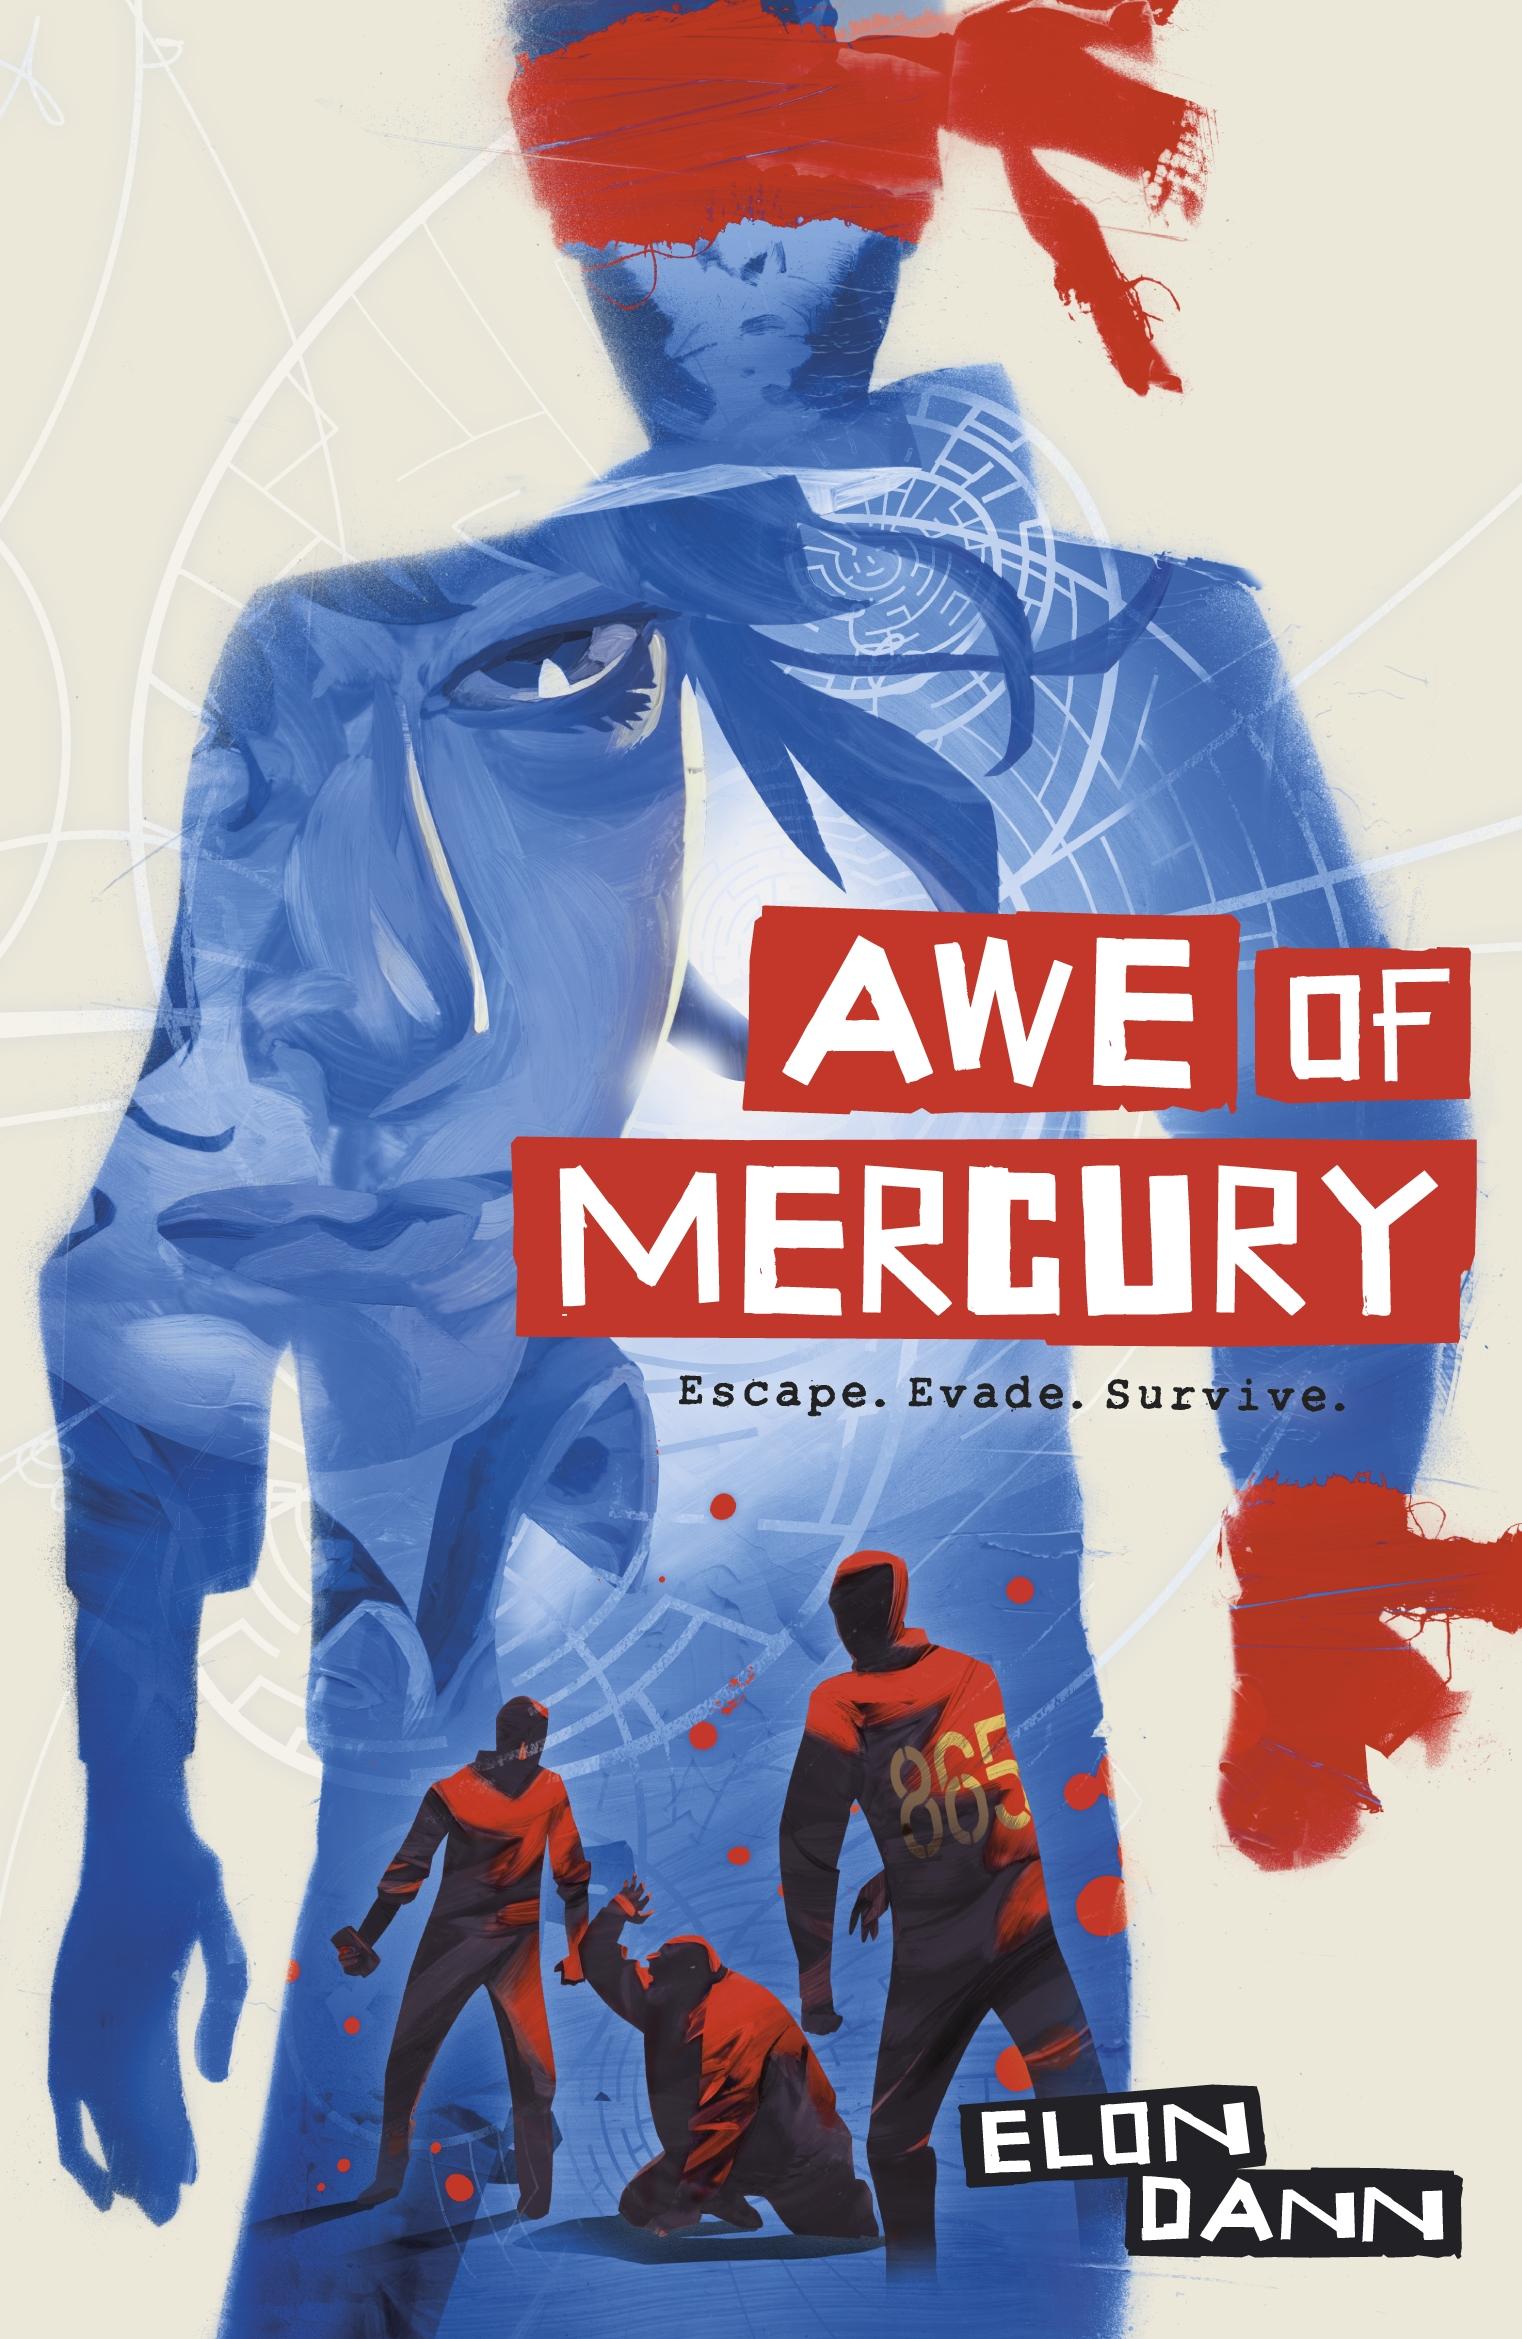 Awe of Mercury by Elon Dann